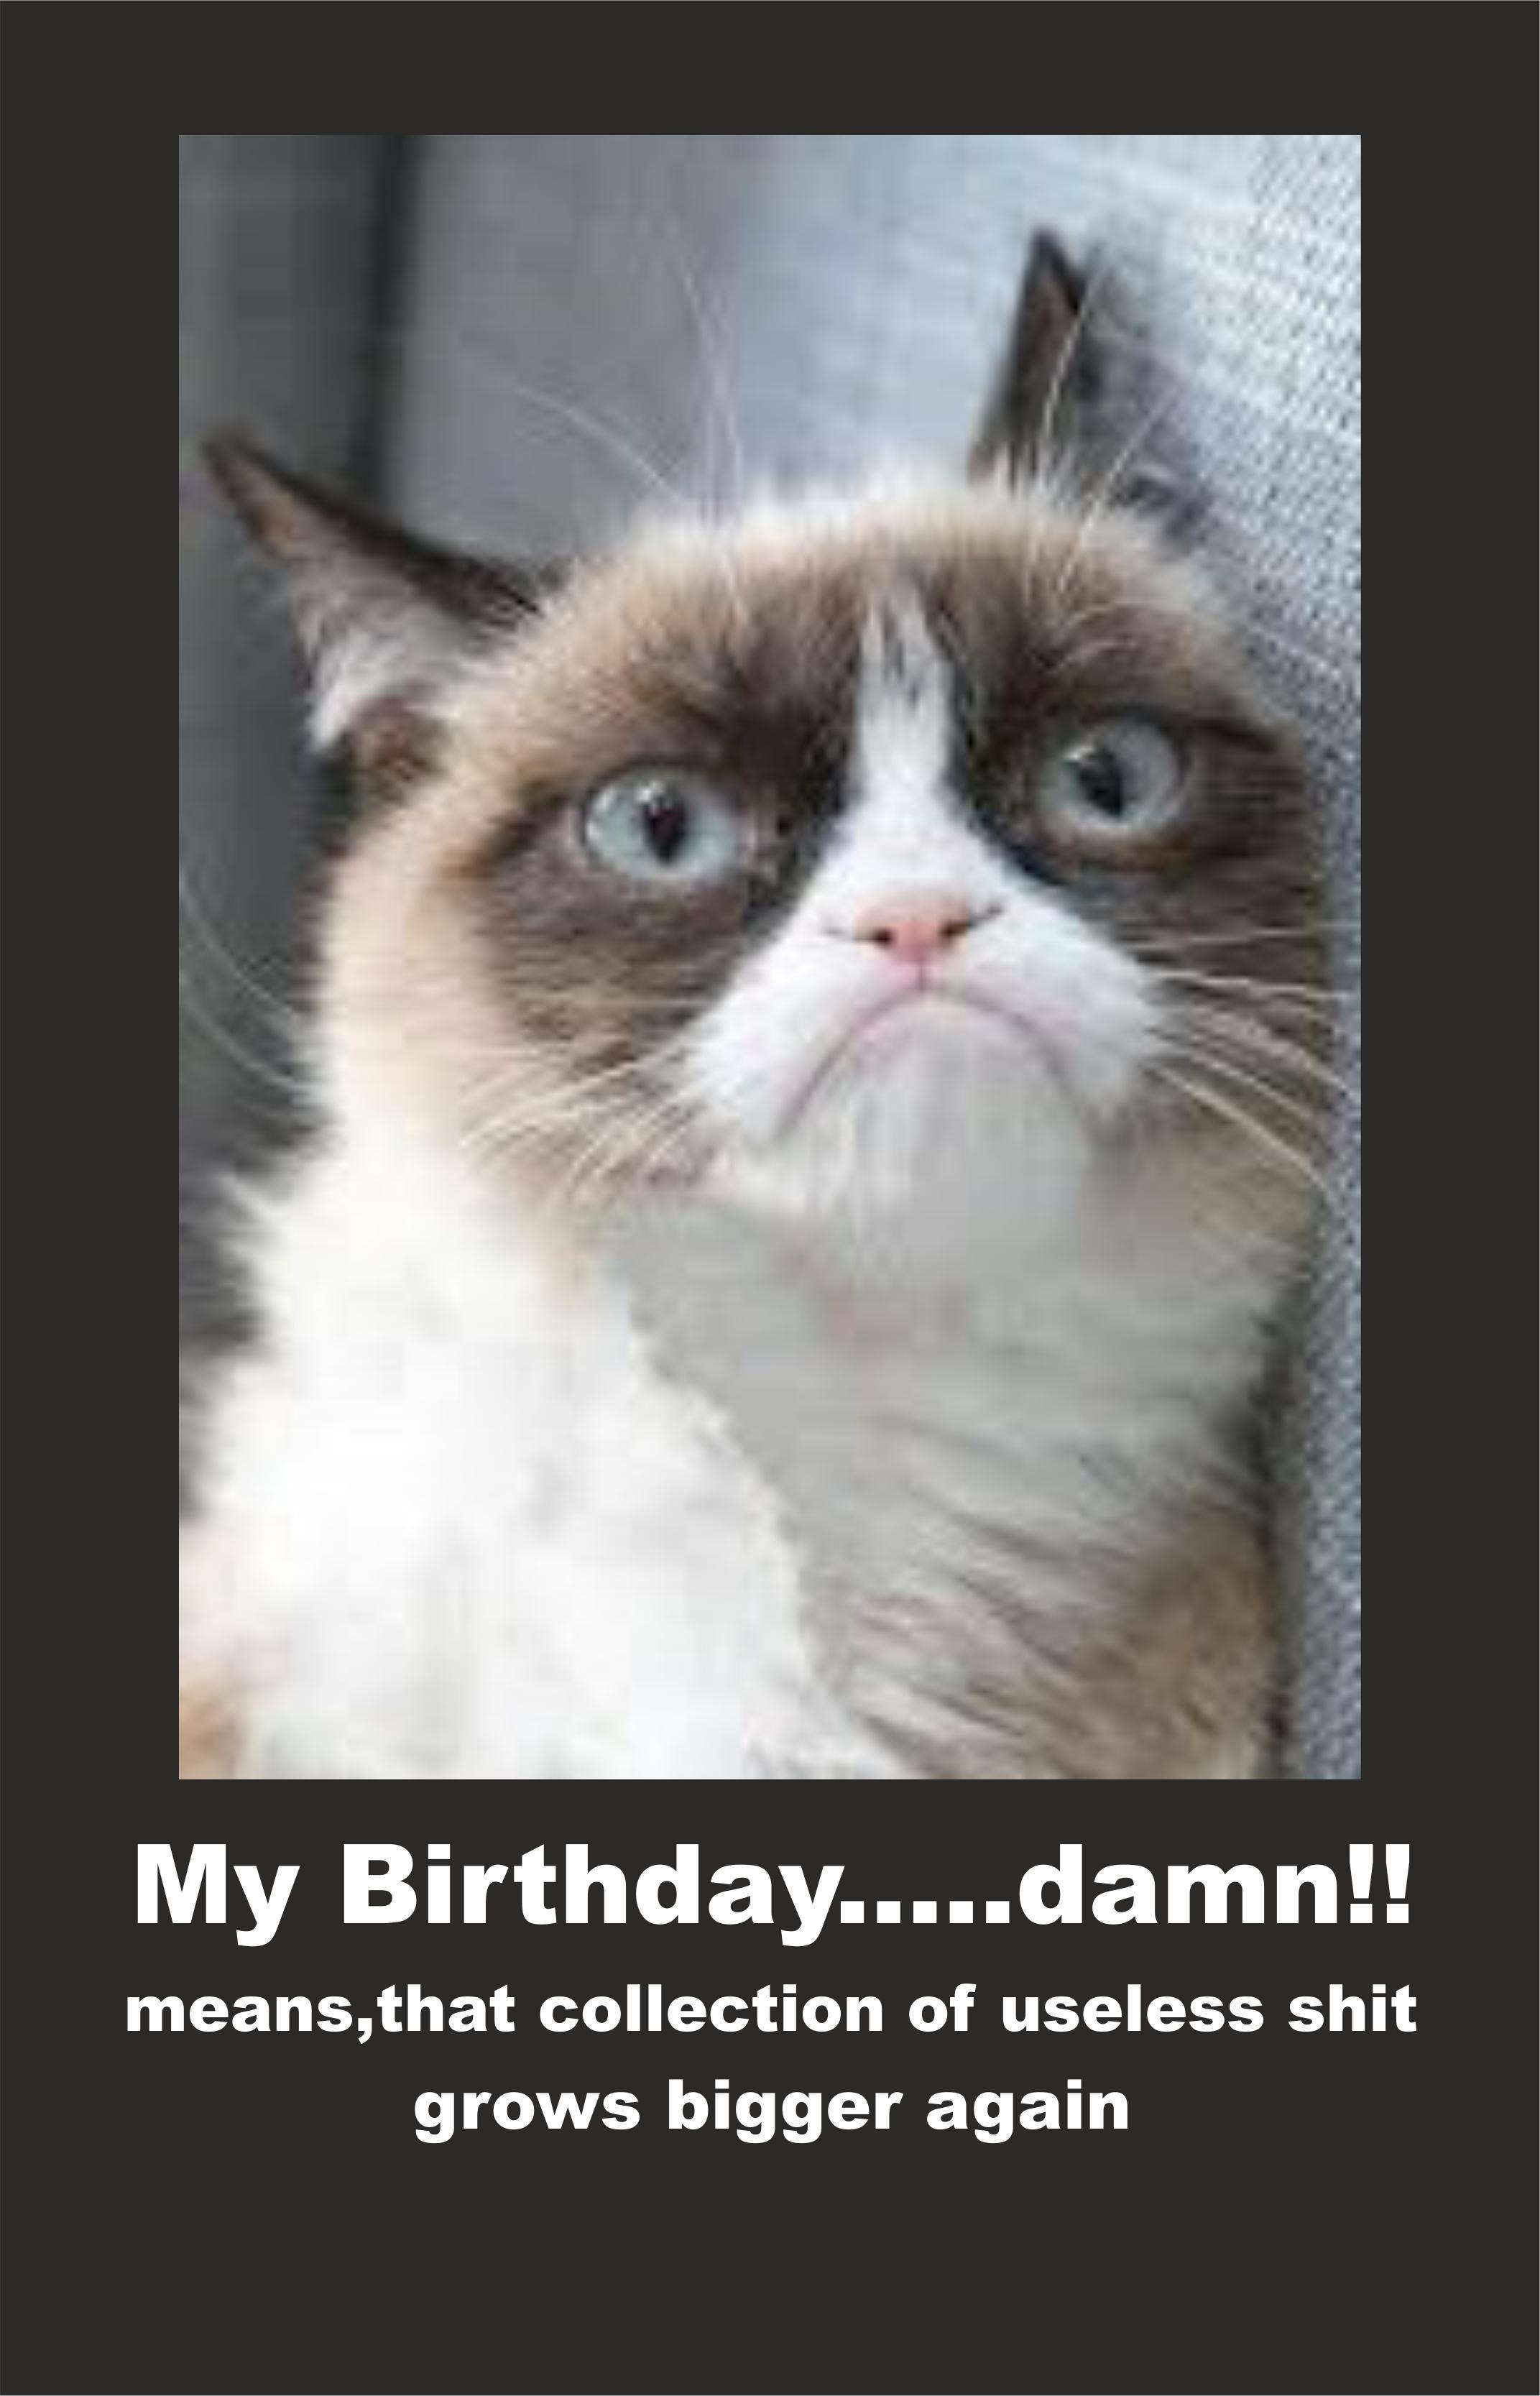 Image - 614122] | Grumpy Cat | Know Your Meme